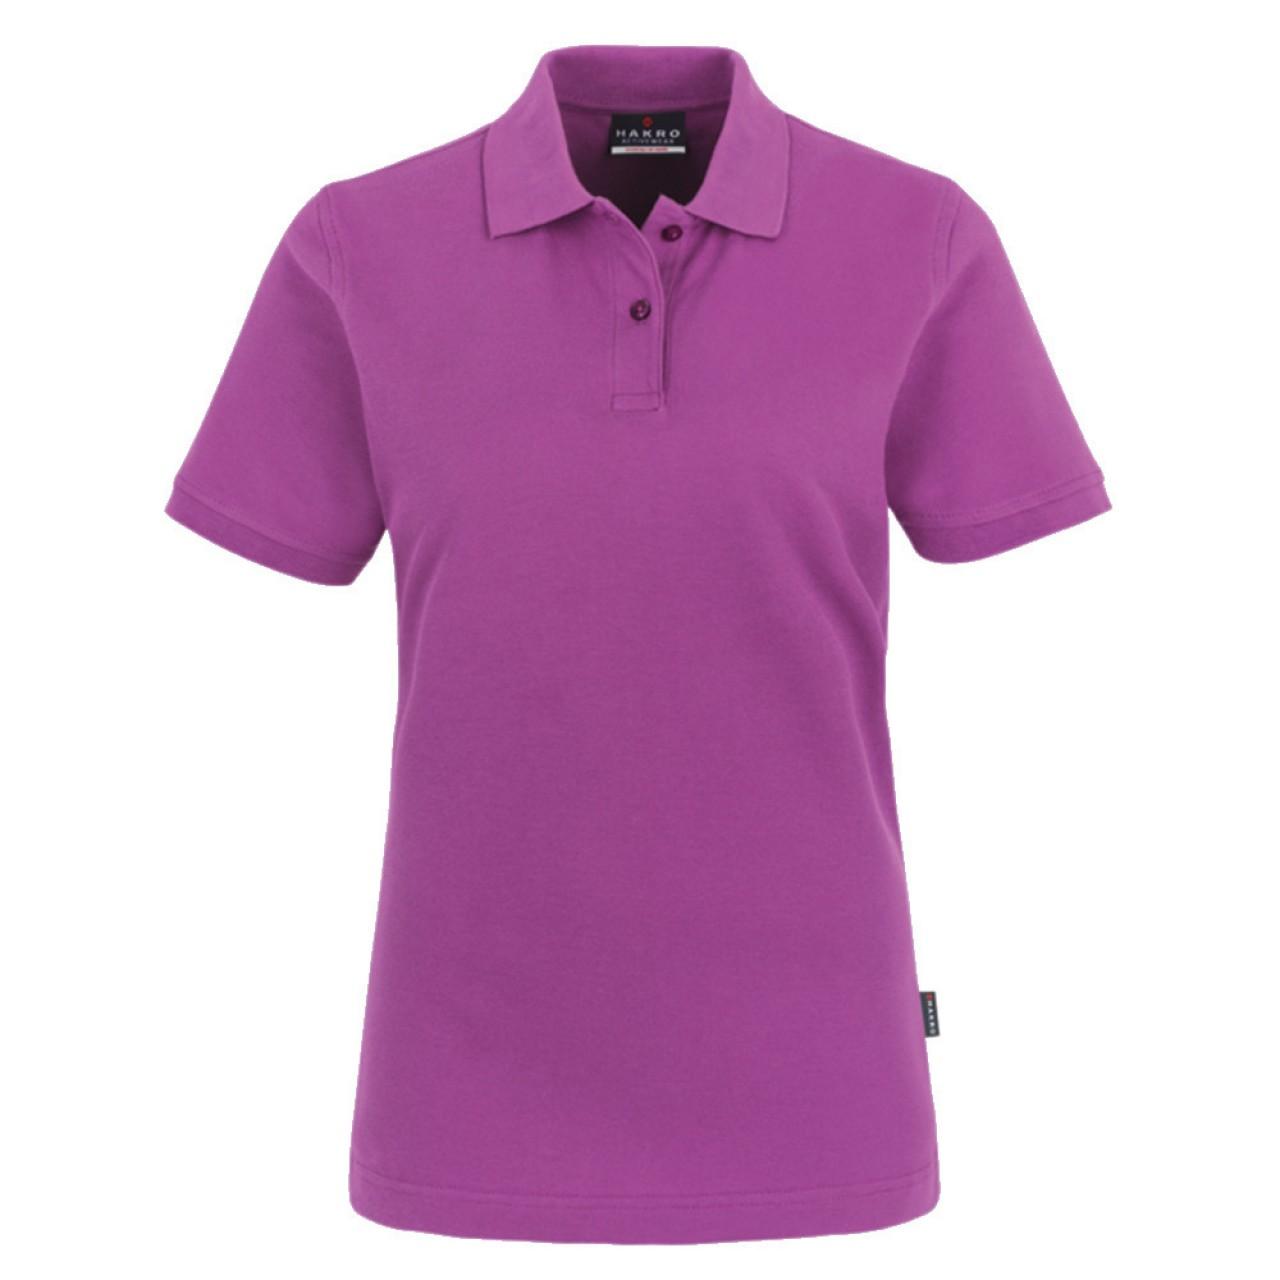 Damen Polo-Shirt Top purple